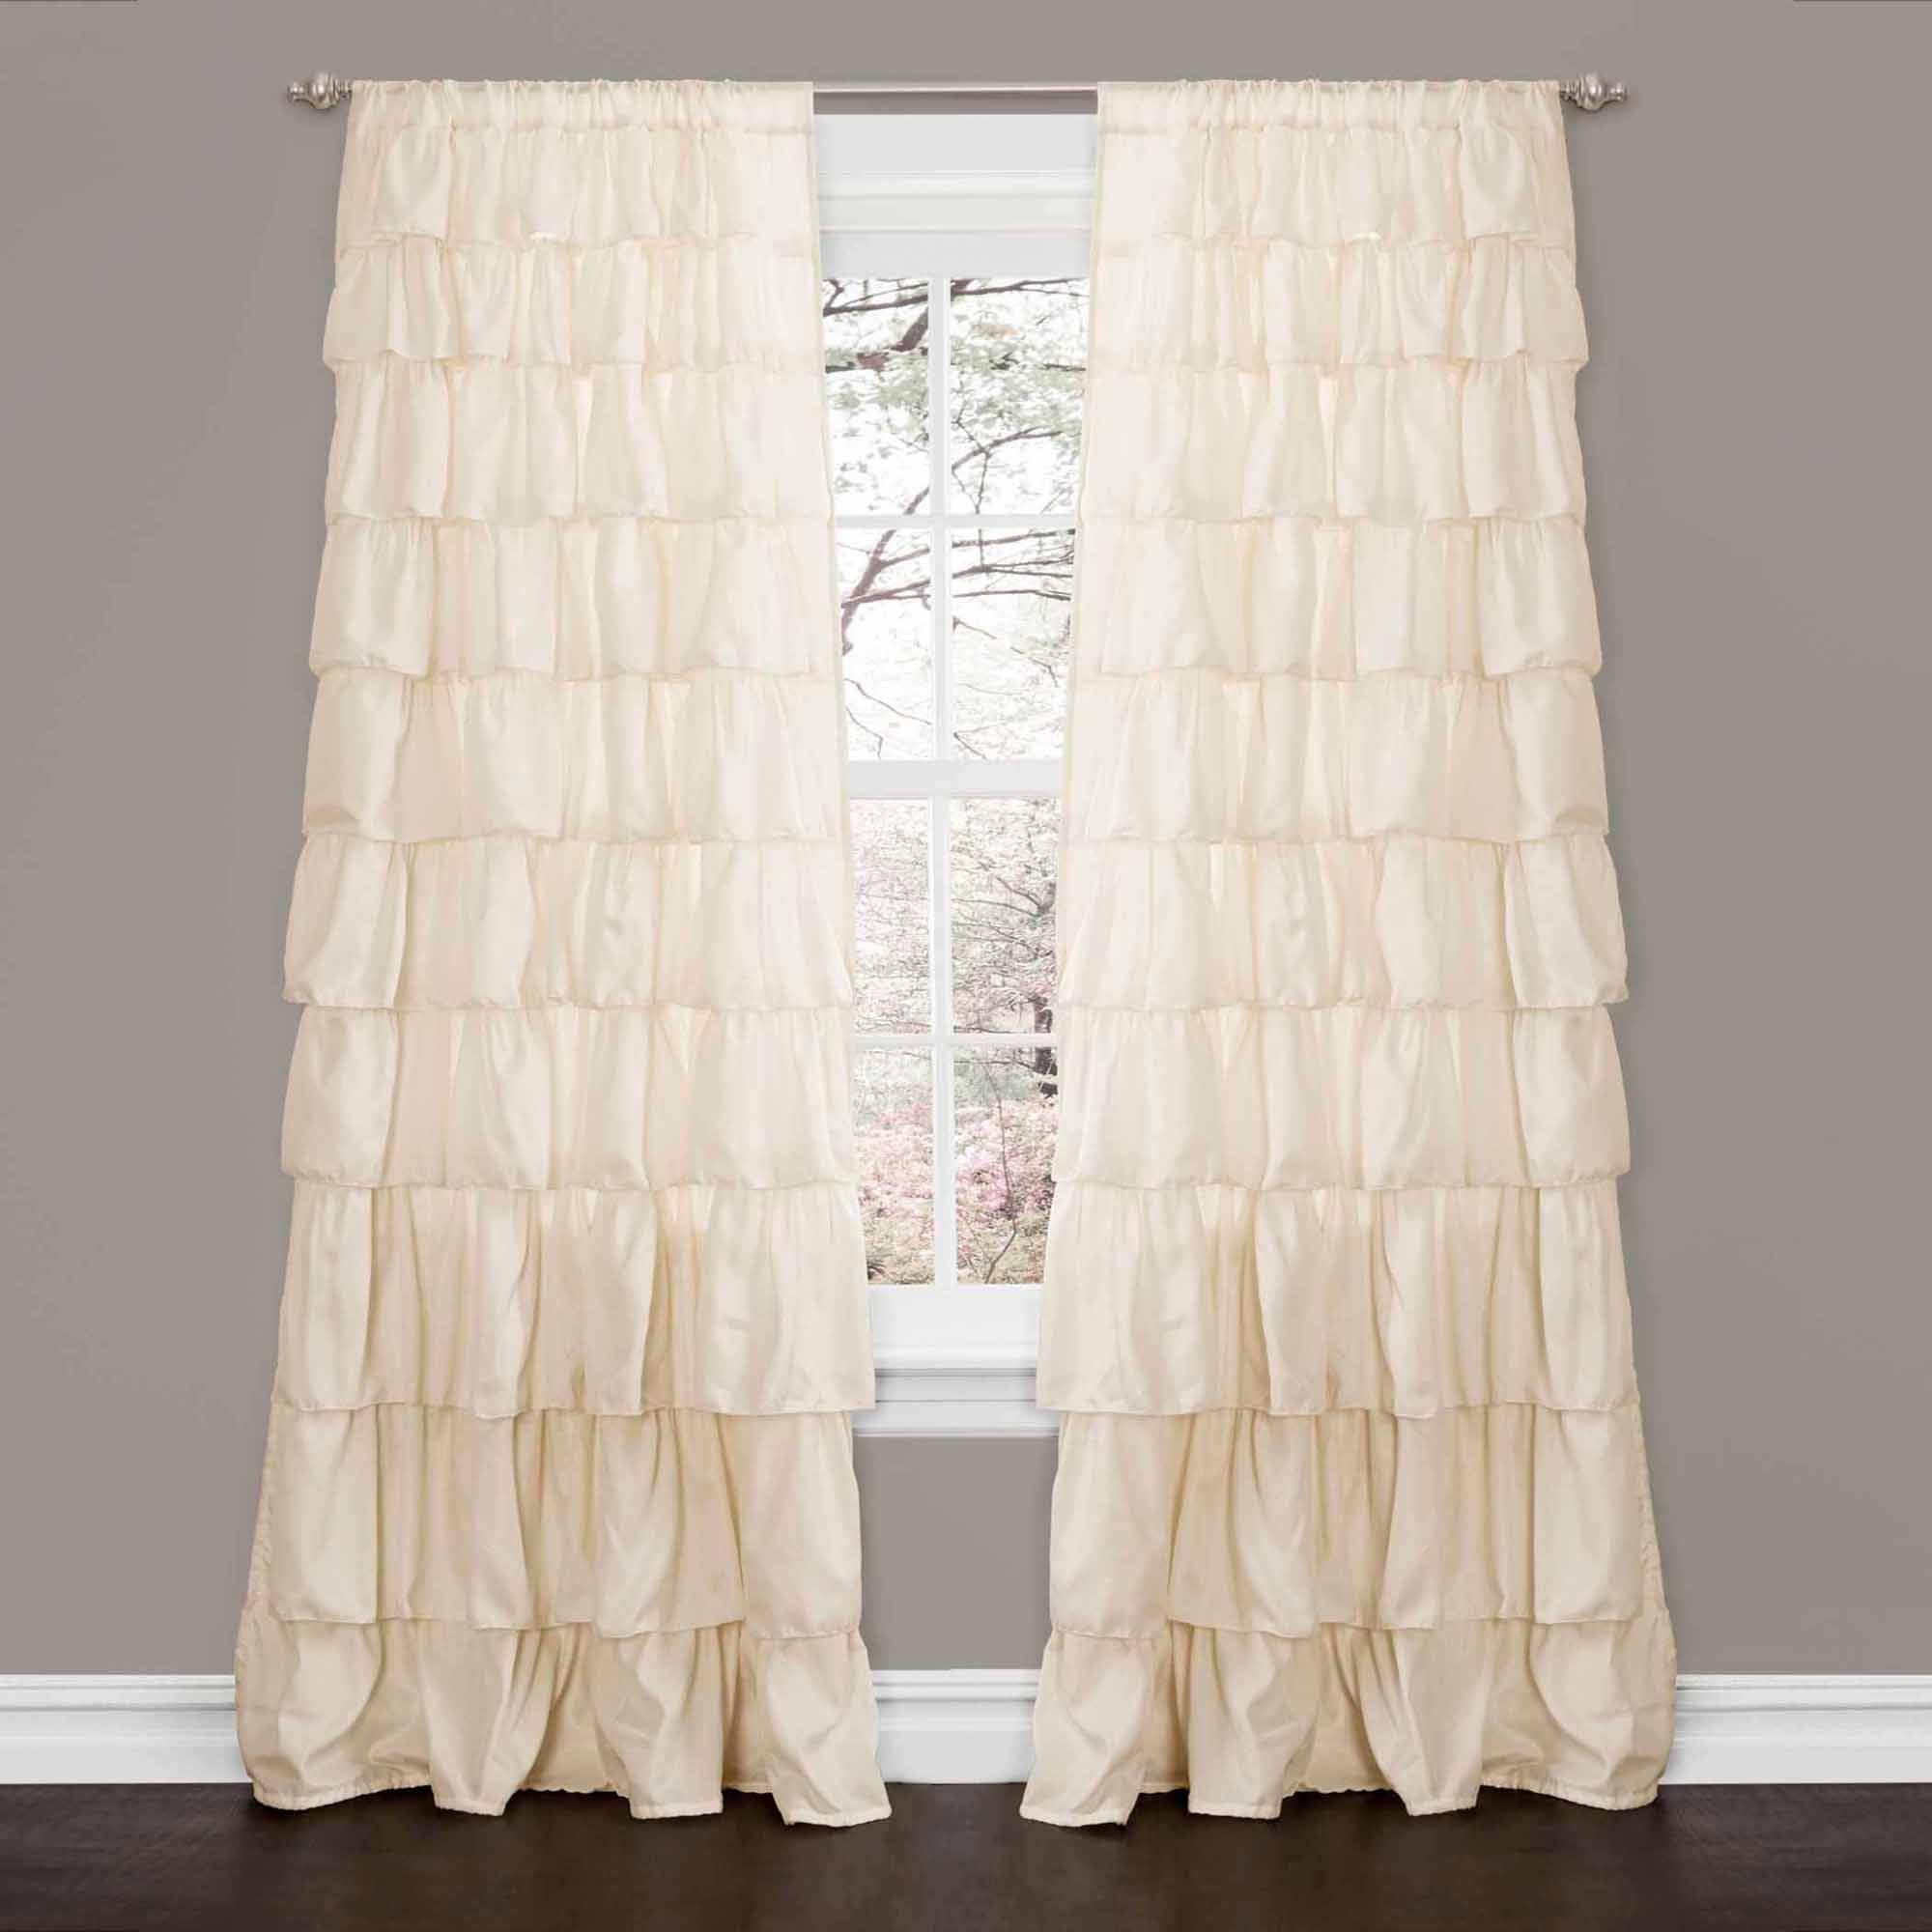 Black ruffle curtains - Ruffle Ivory Window Curtain